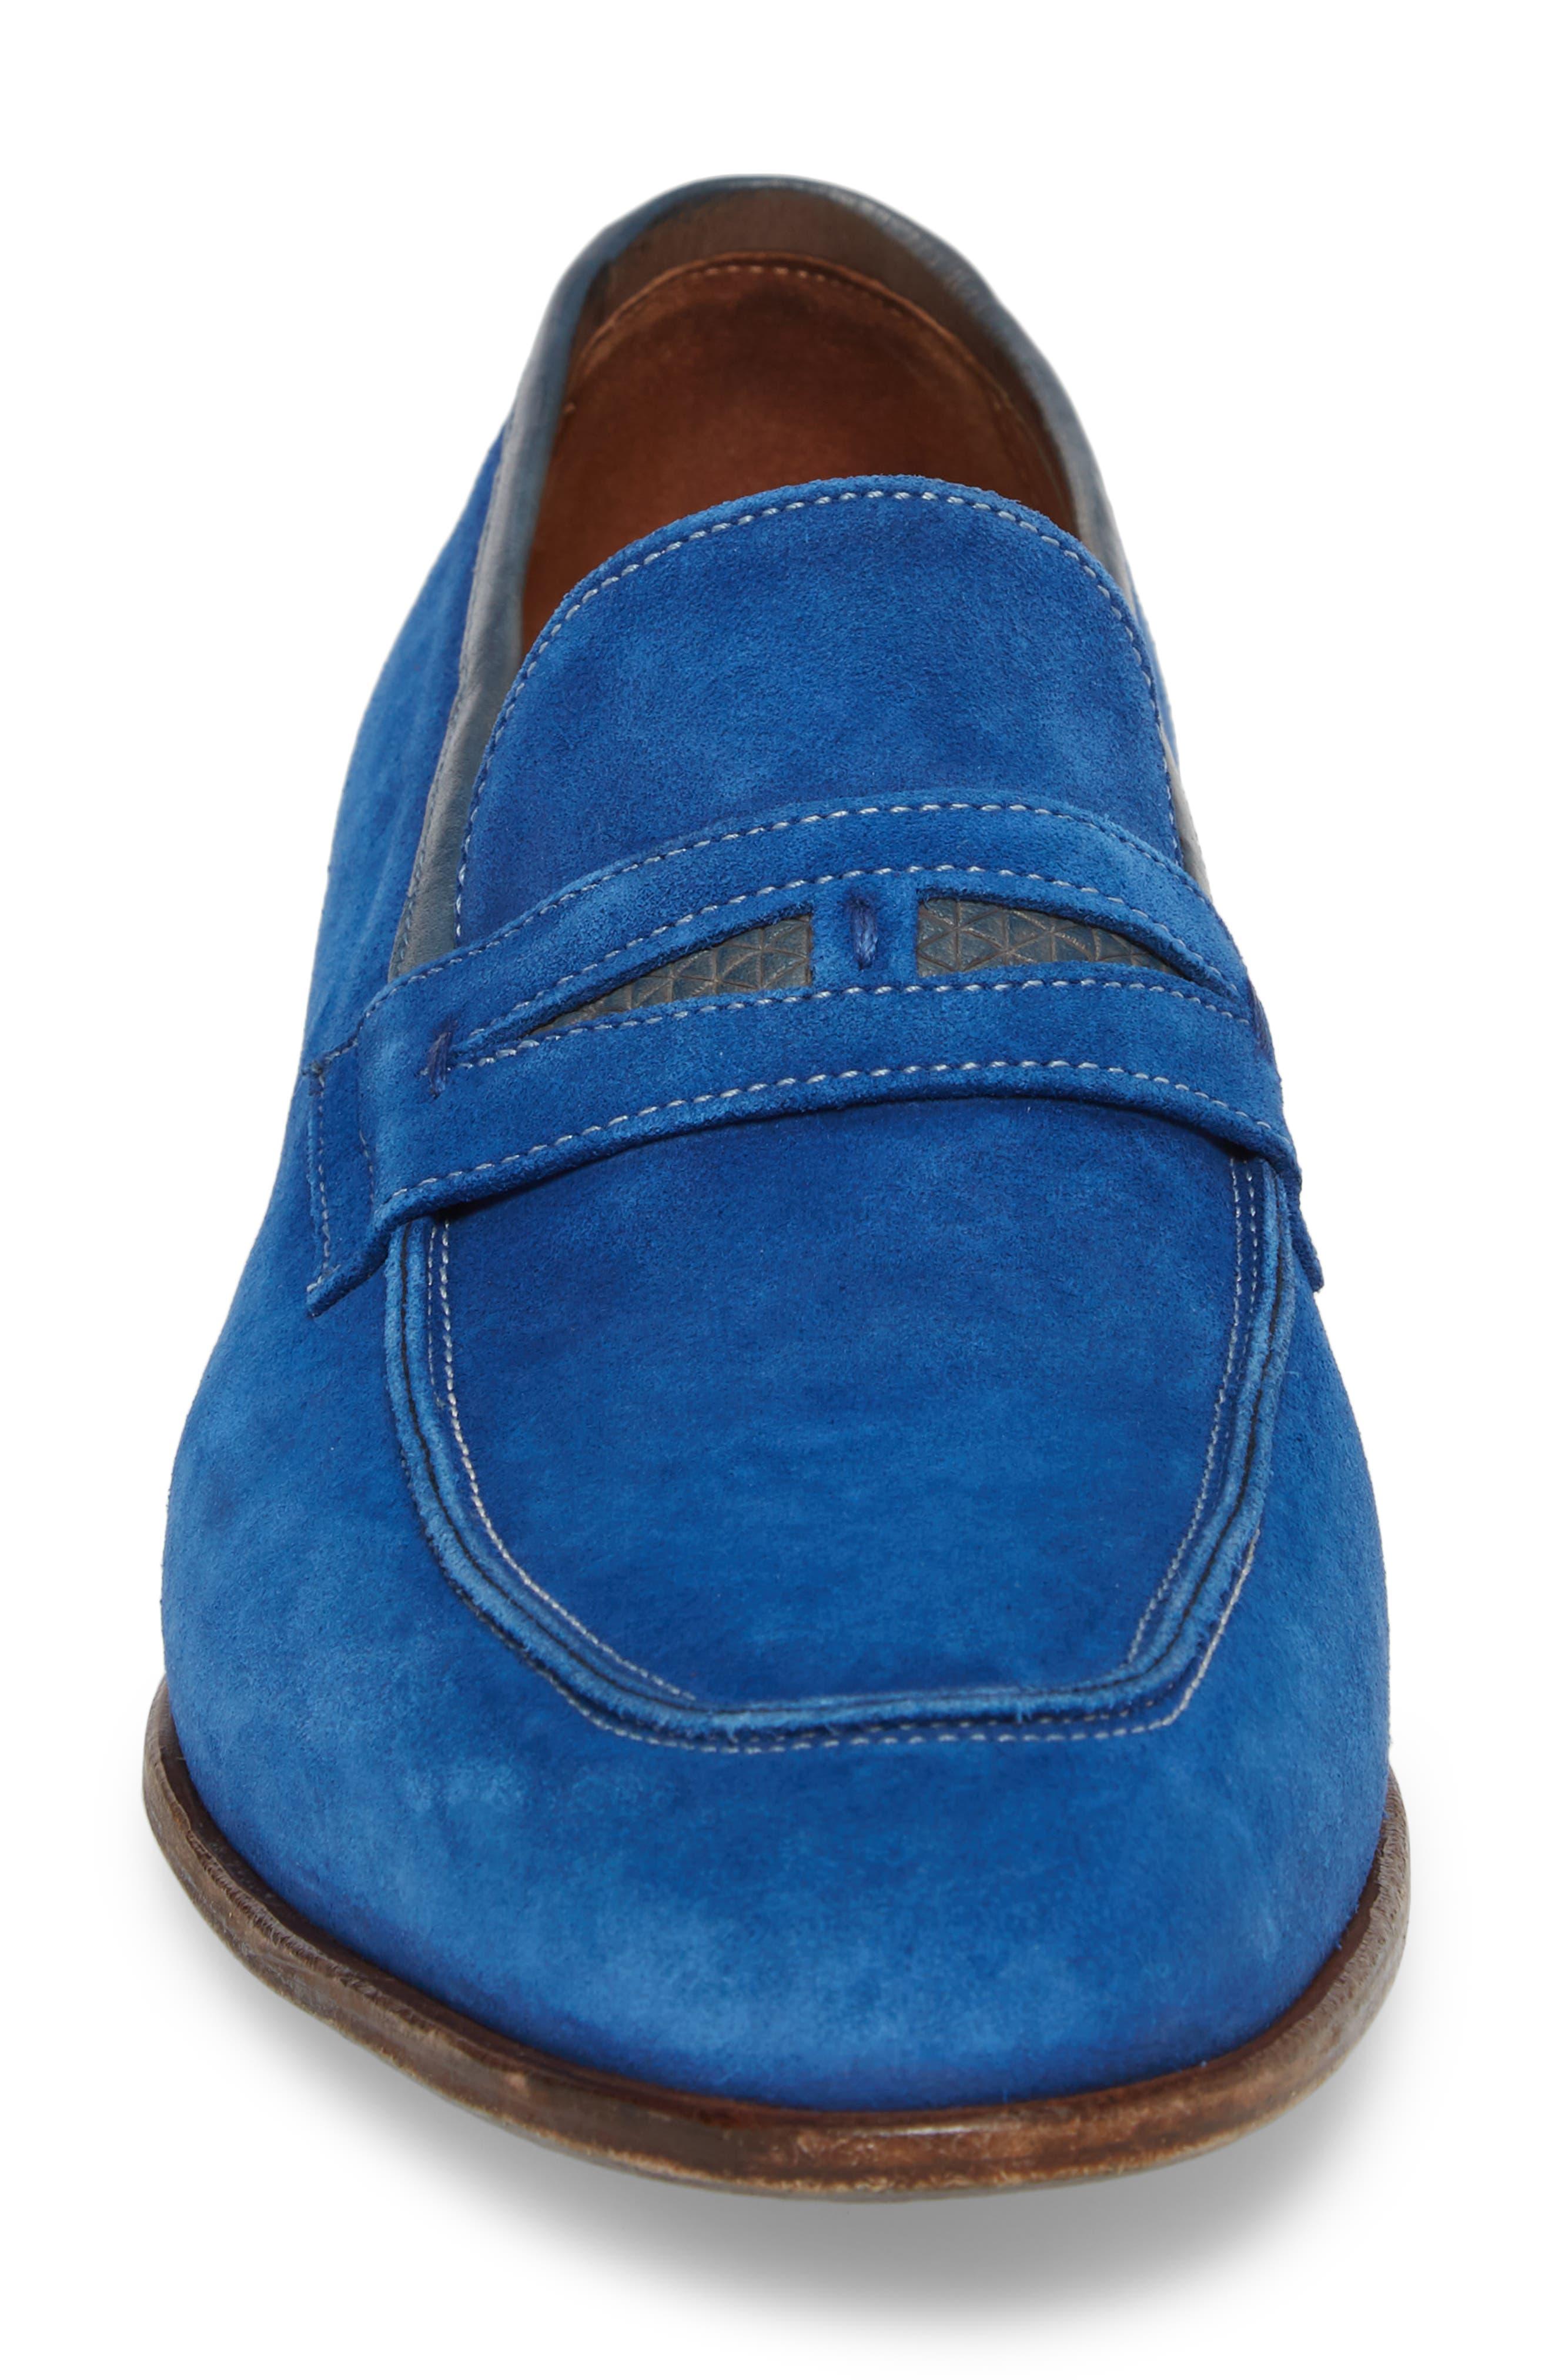 Lex Apron Toe Penny Loafer,                             Alternate thumbnail 4, color,                             Blue Suede